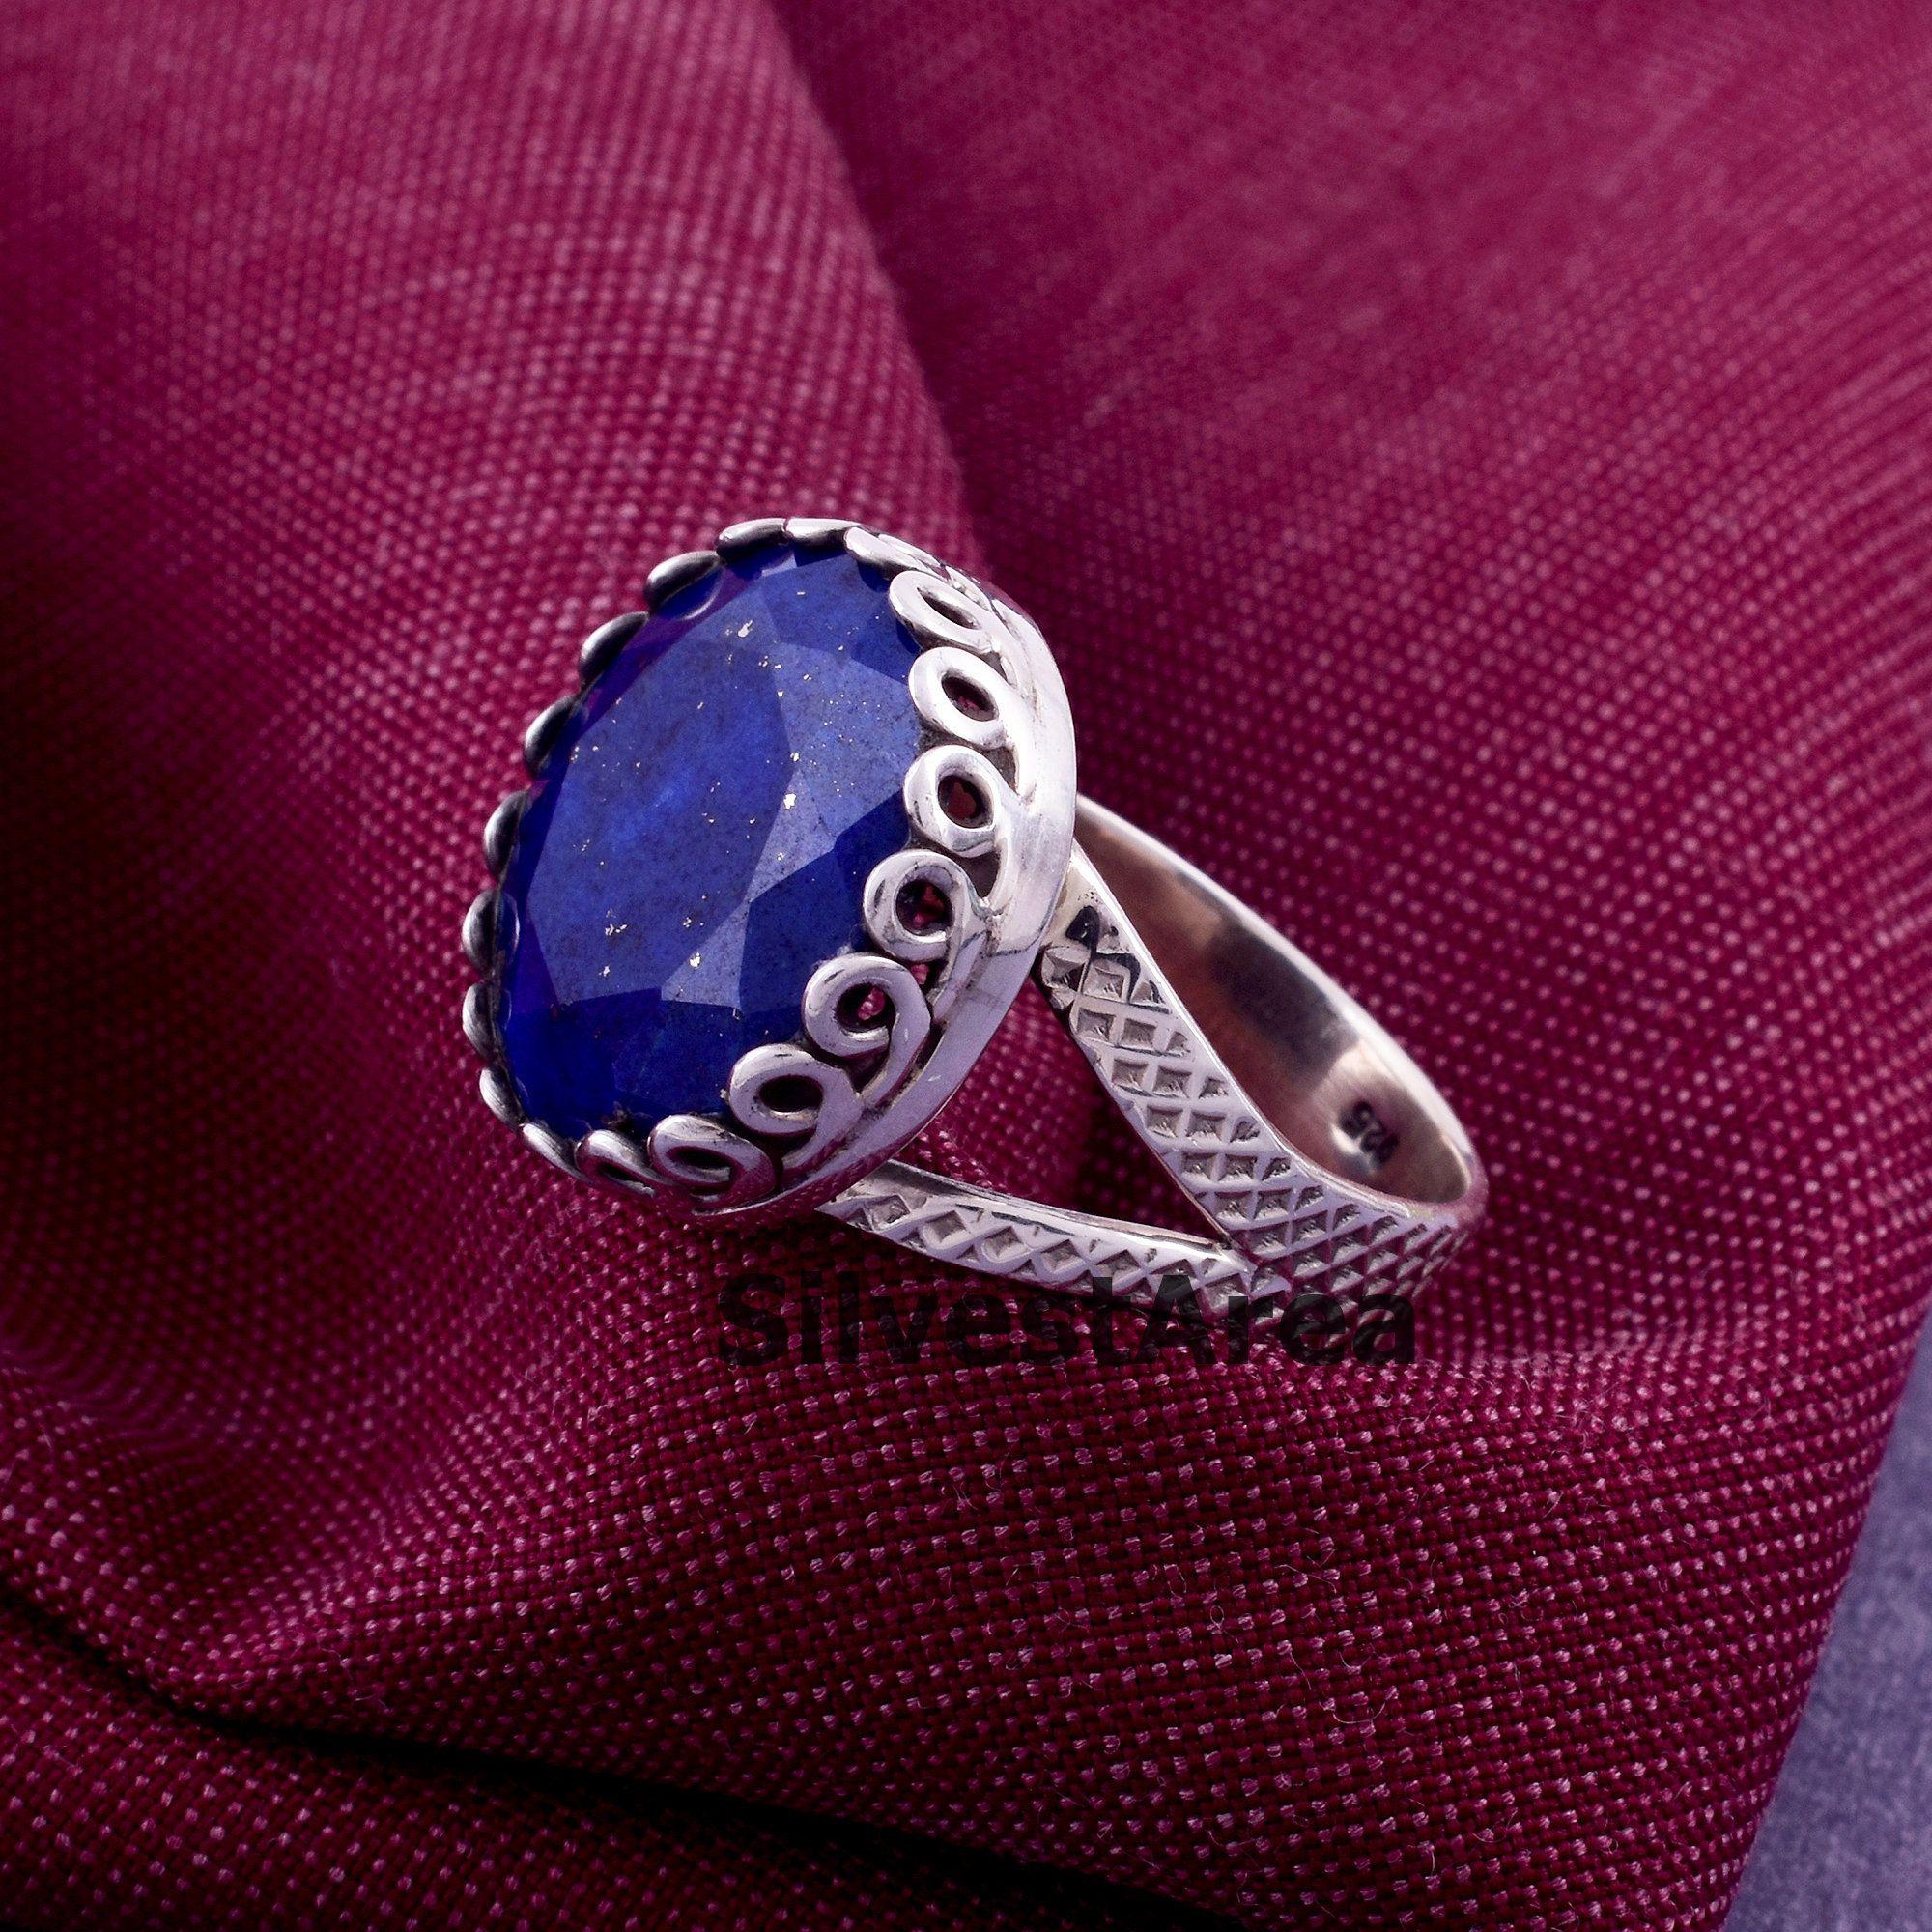 Woman/'s Jewelry Handmade Jewelry Texture Meditation Ring Artisan Gift Blue Stone Ring Designer Ring Spinner Ring Lapis Lazuli Ring